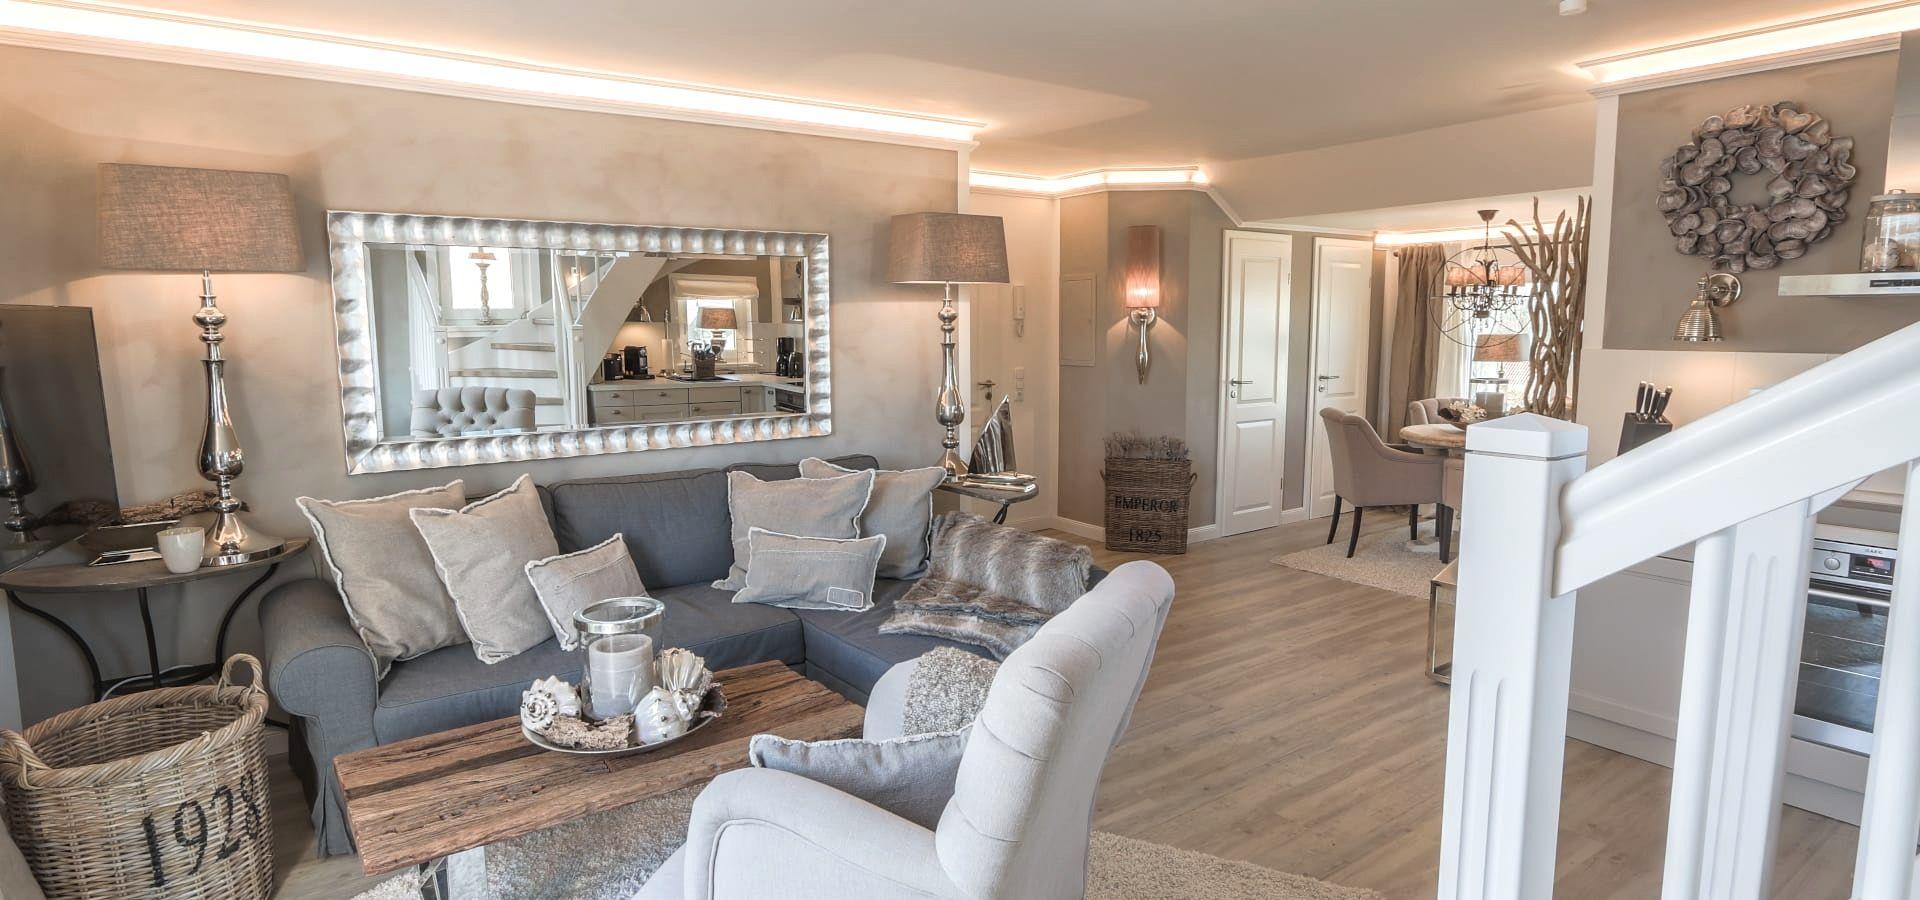 einrichtung landhausstil modern Shabby chic living room